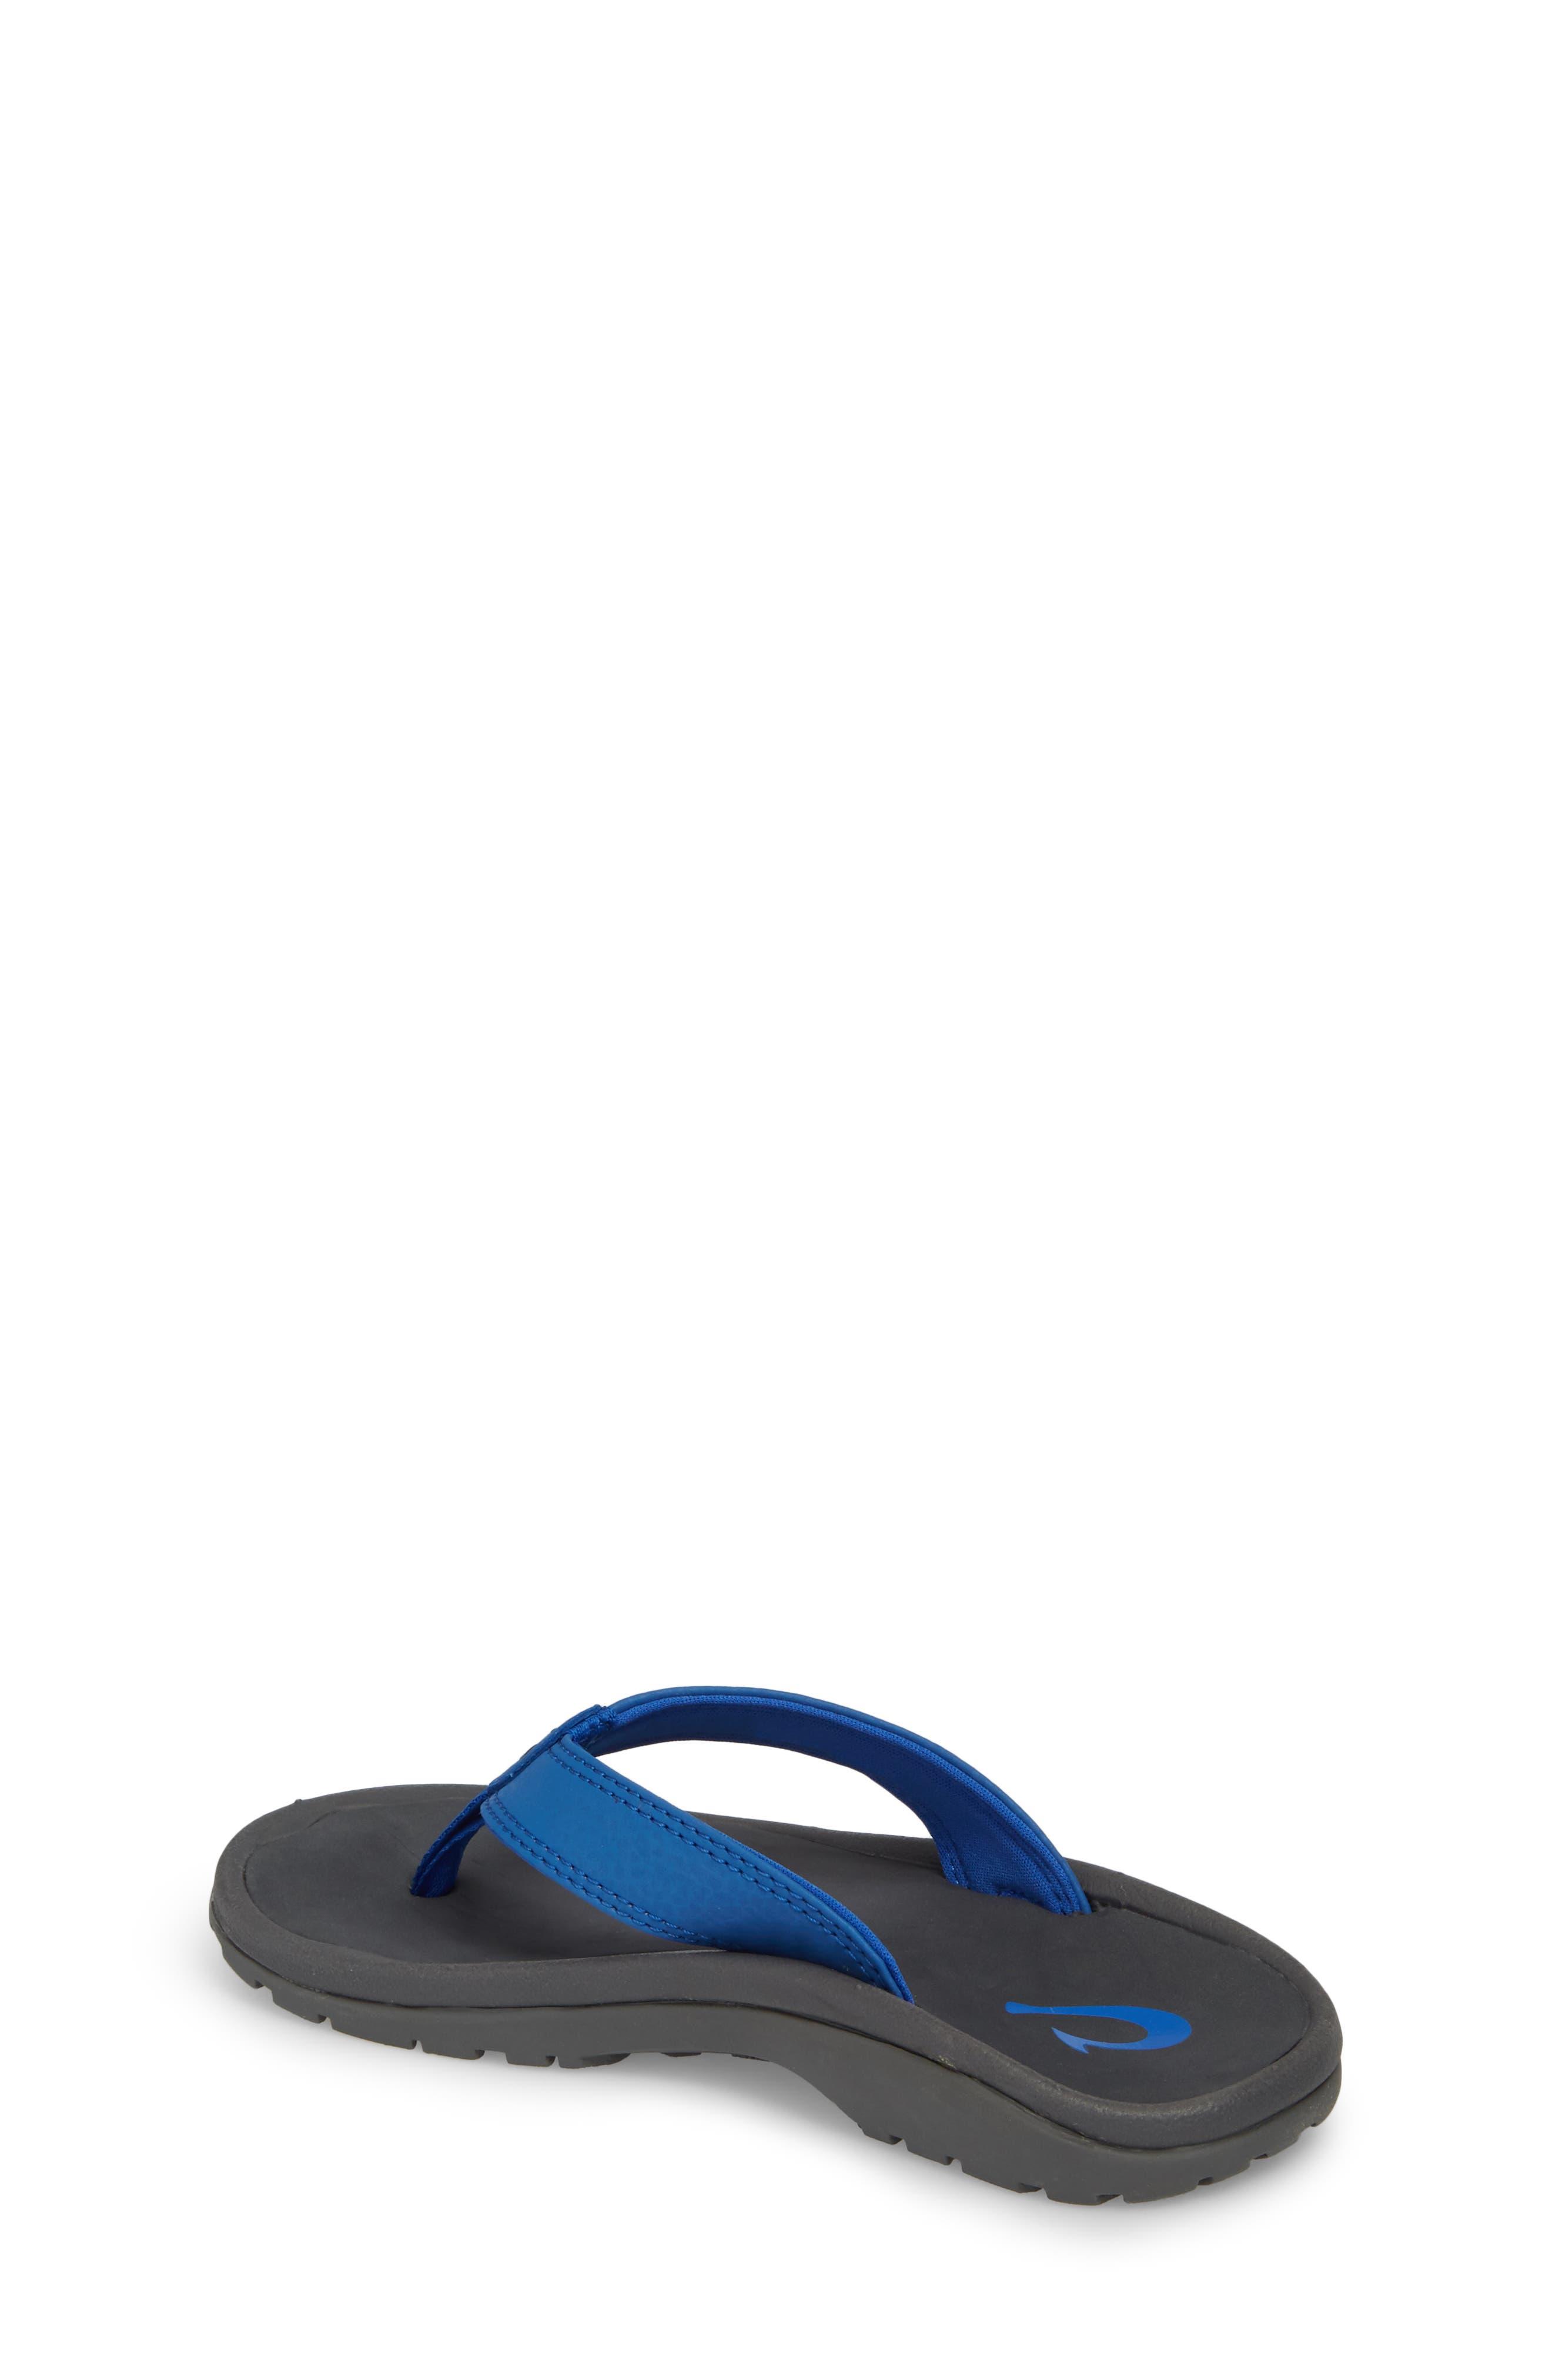 'Ohana' Sandal,                             Alternate thumbnail 2, color,                             AQUA BLUE/ DARK SHADOW